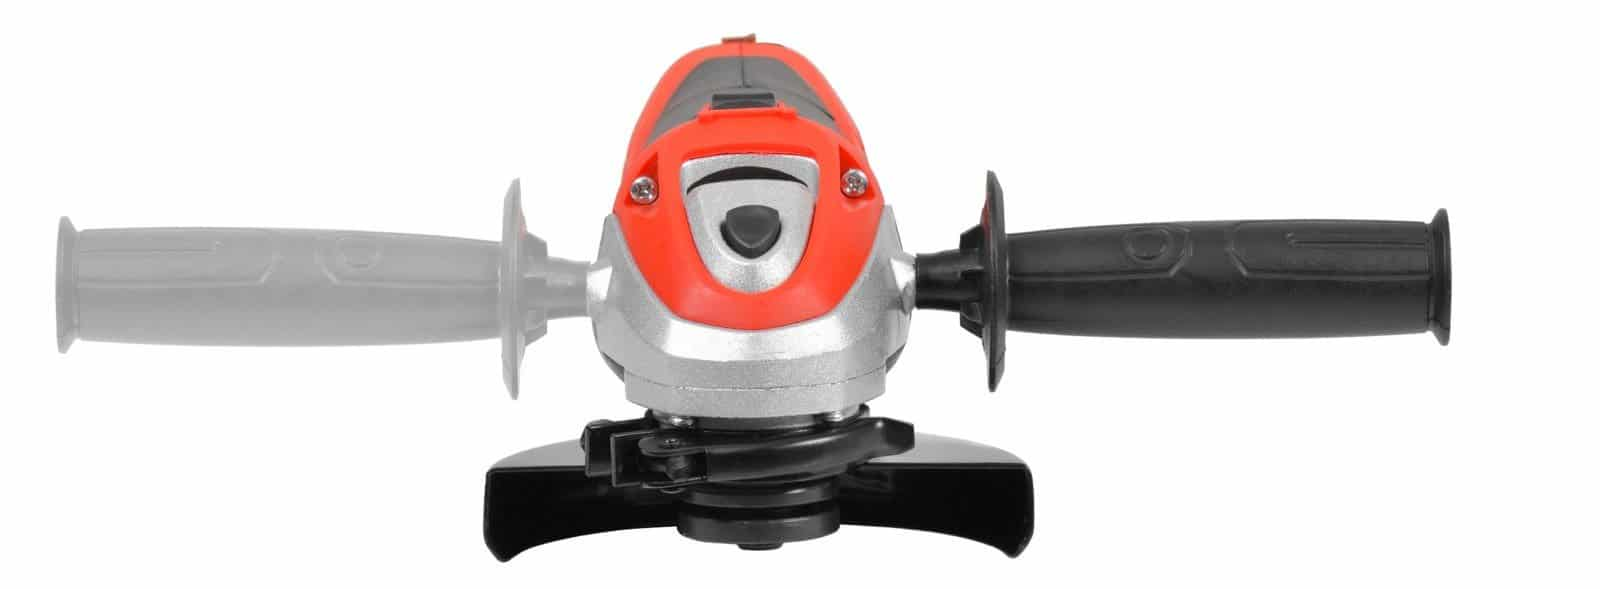 Rebarbadora HCT AG1391 - 900W